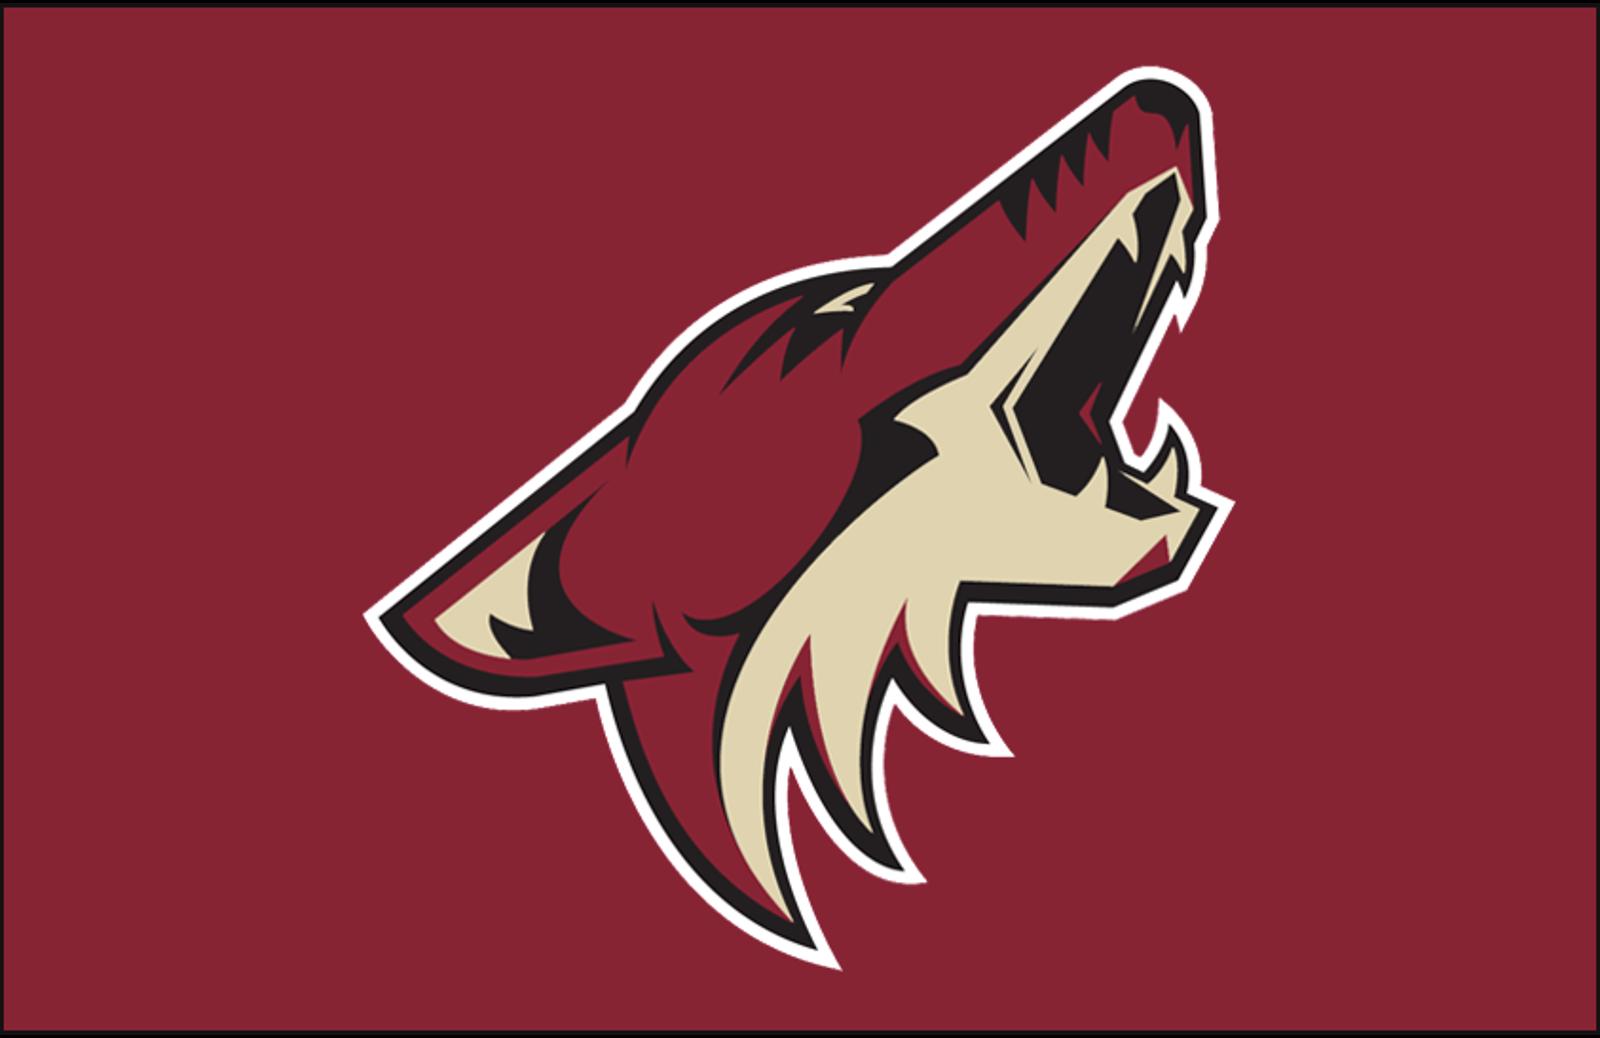 41. Arizona Coyotes